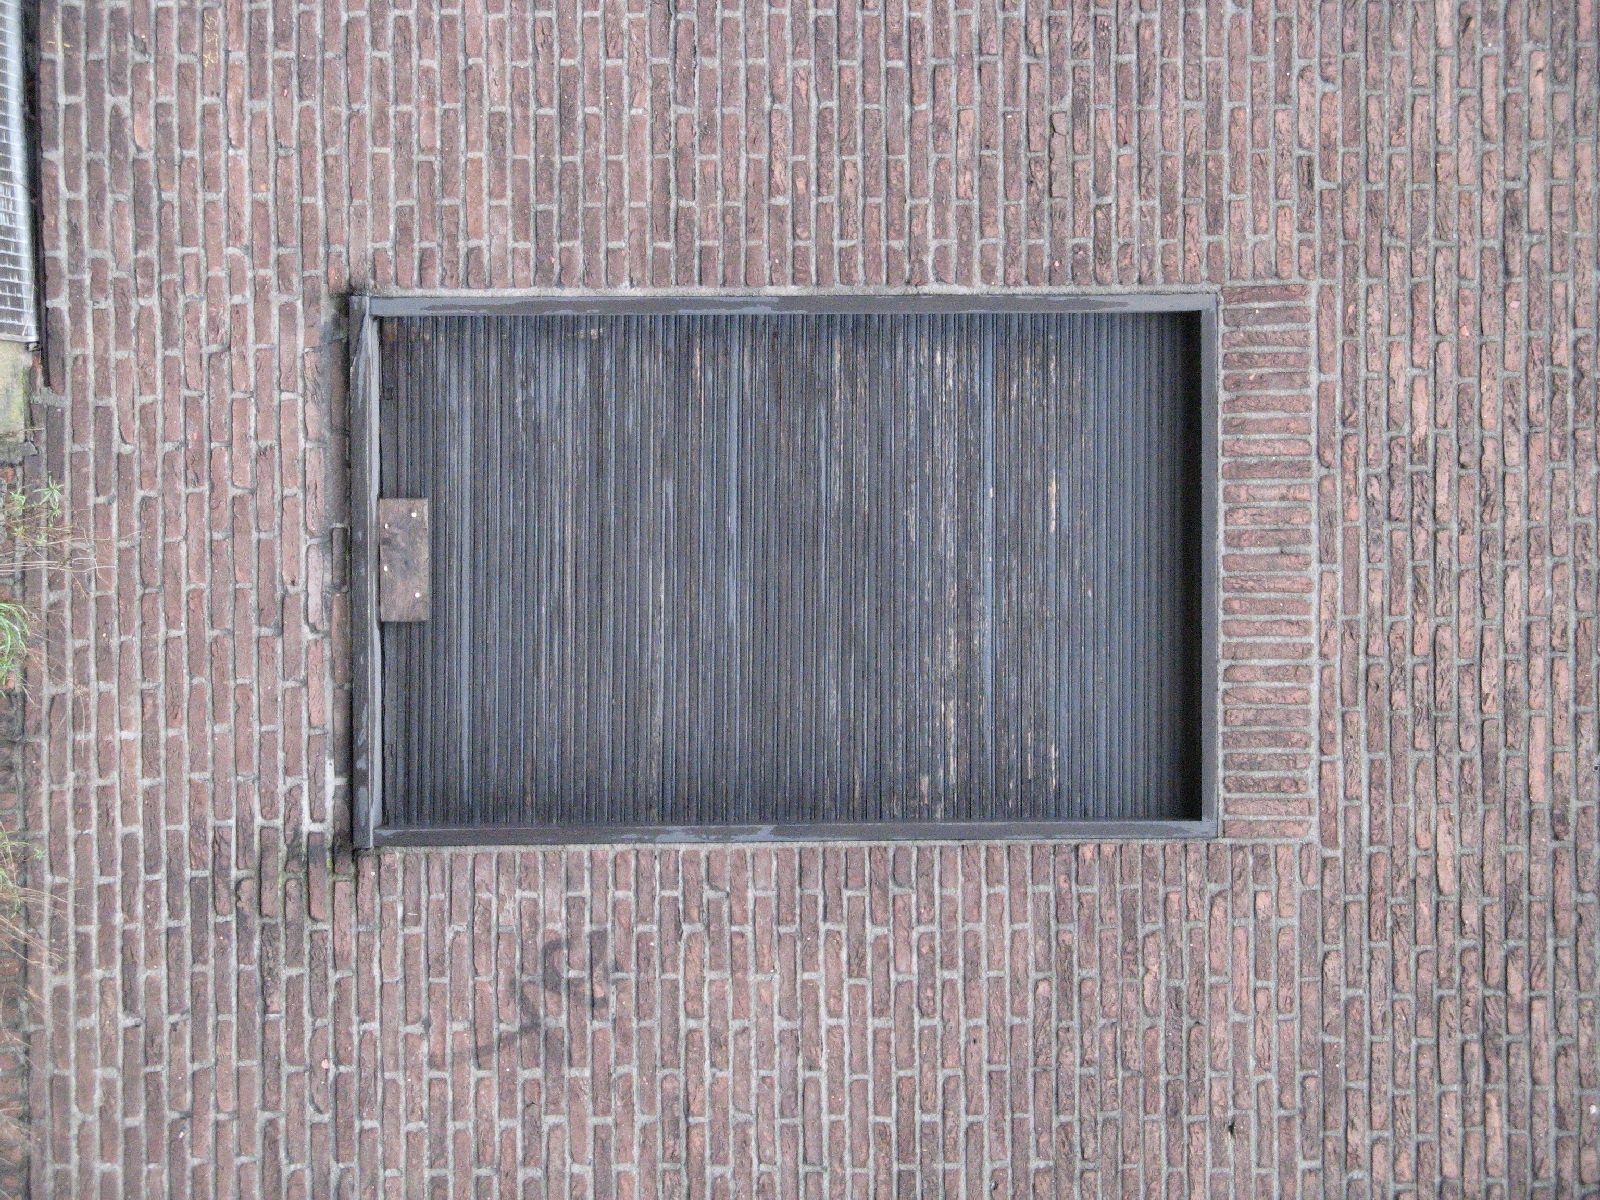 Building_Texture_B_3993